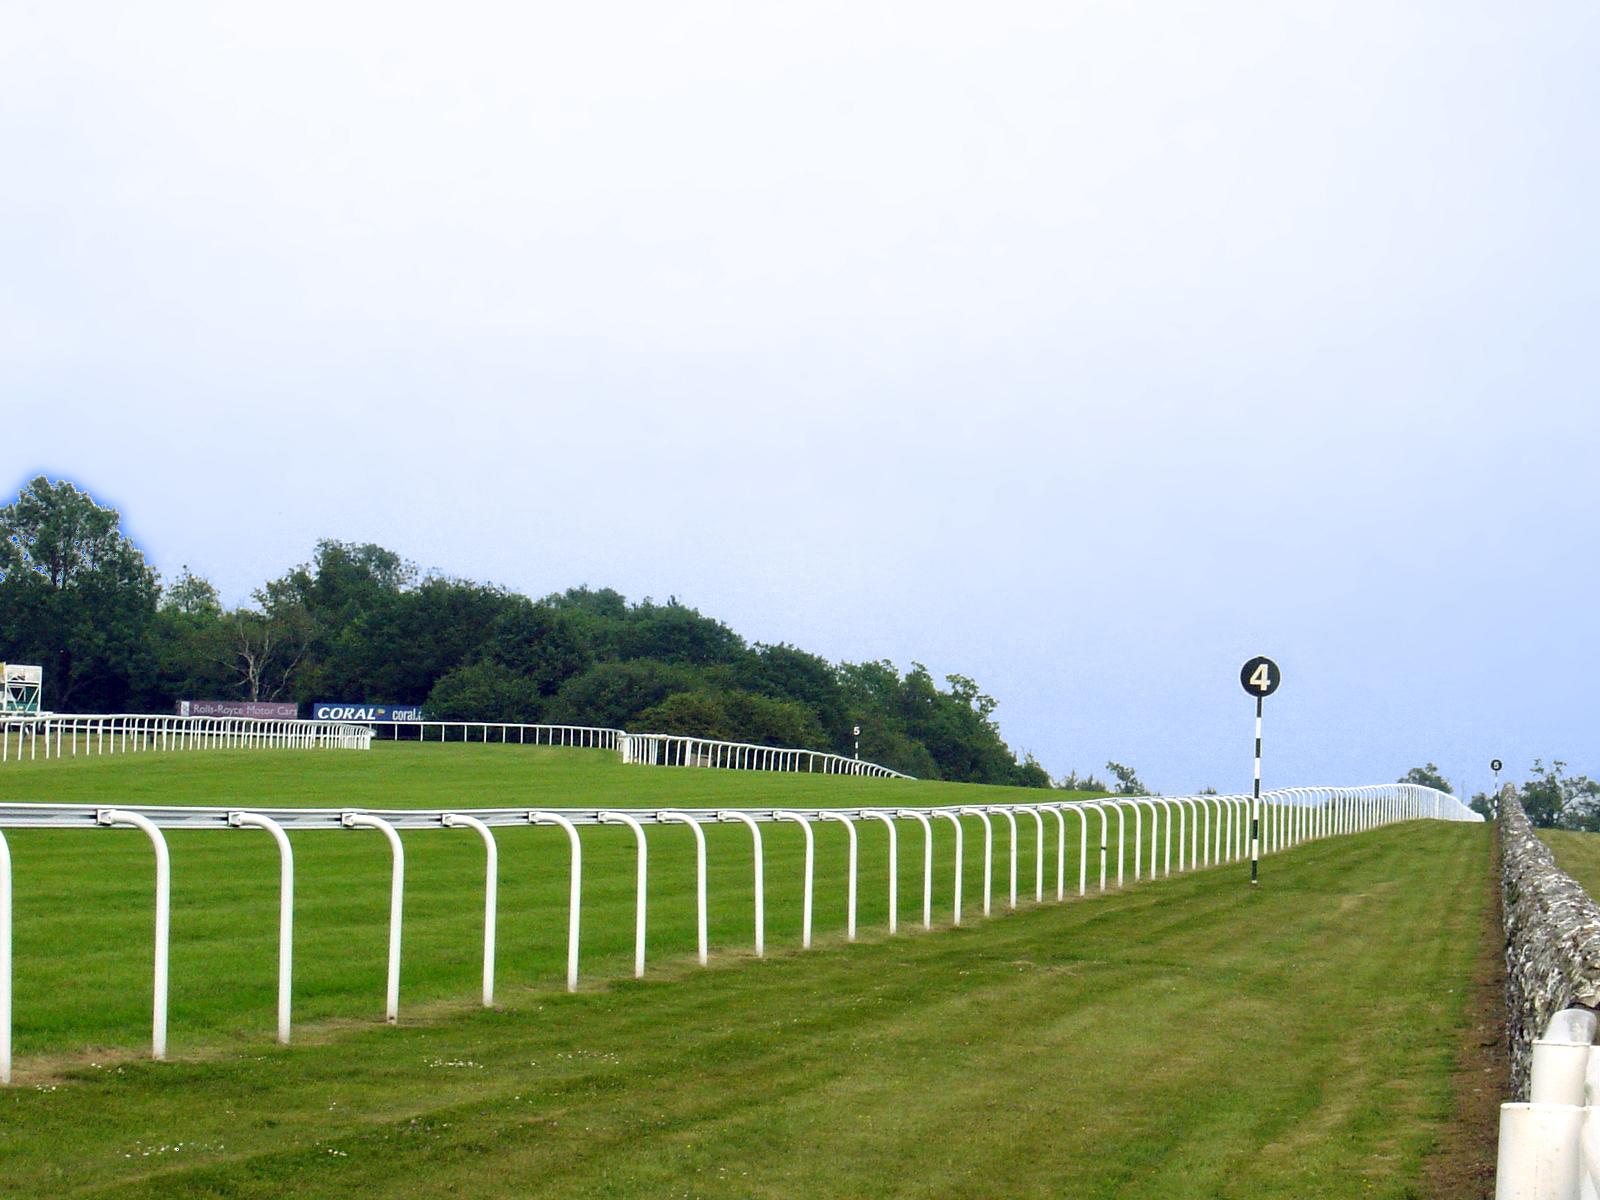 Goodwood Racecourse, West Sussex, England